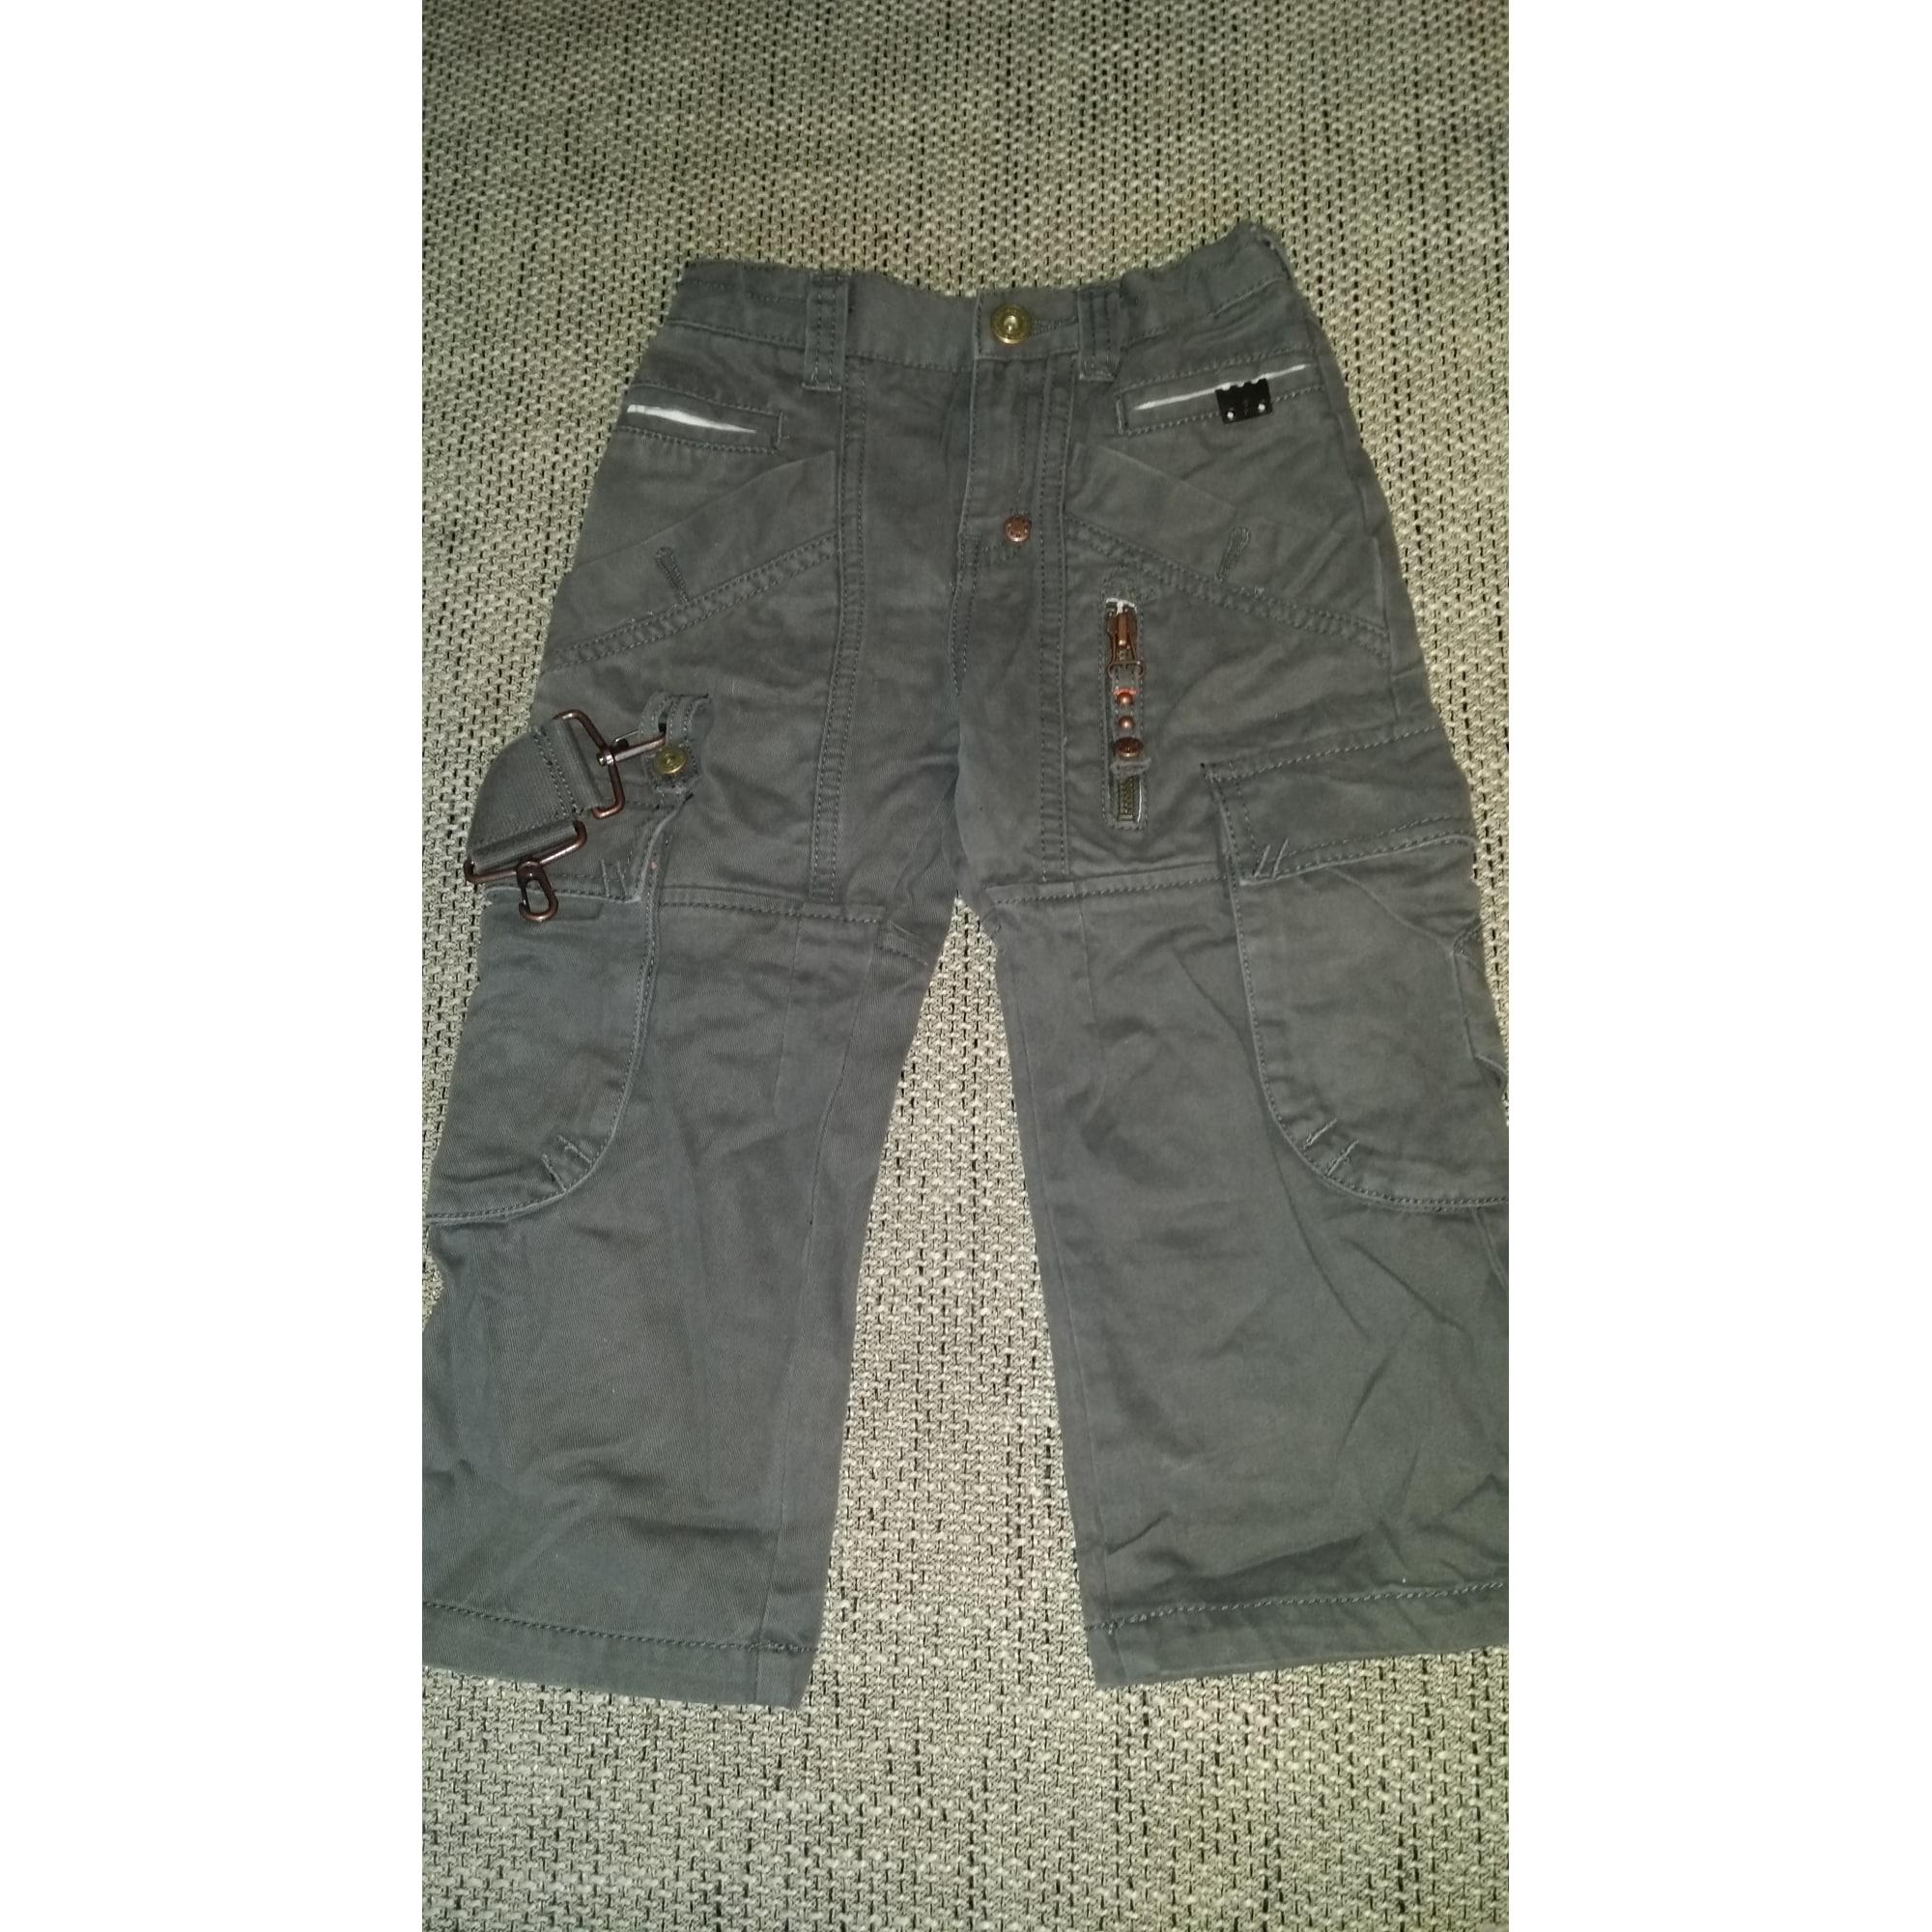 Pantalon DKNY Gris, anthracite